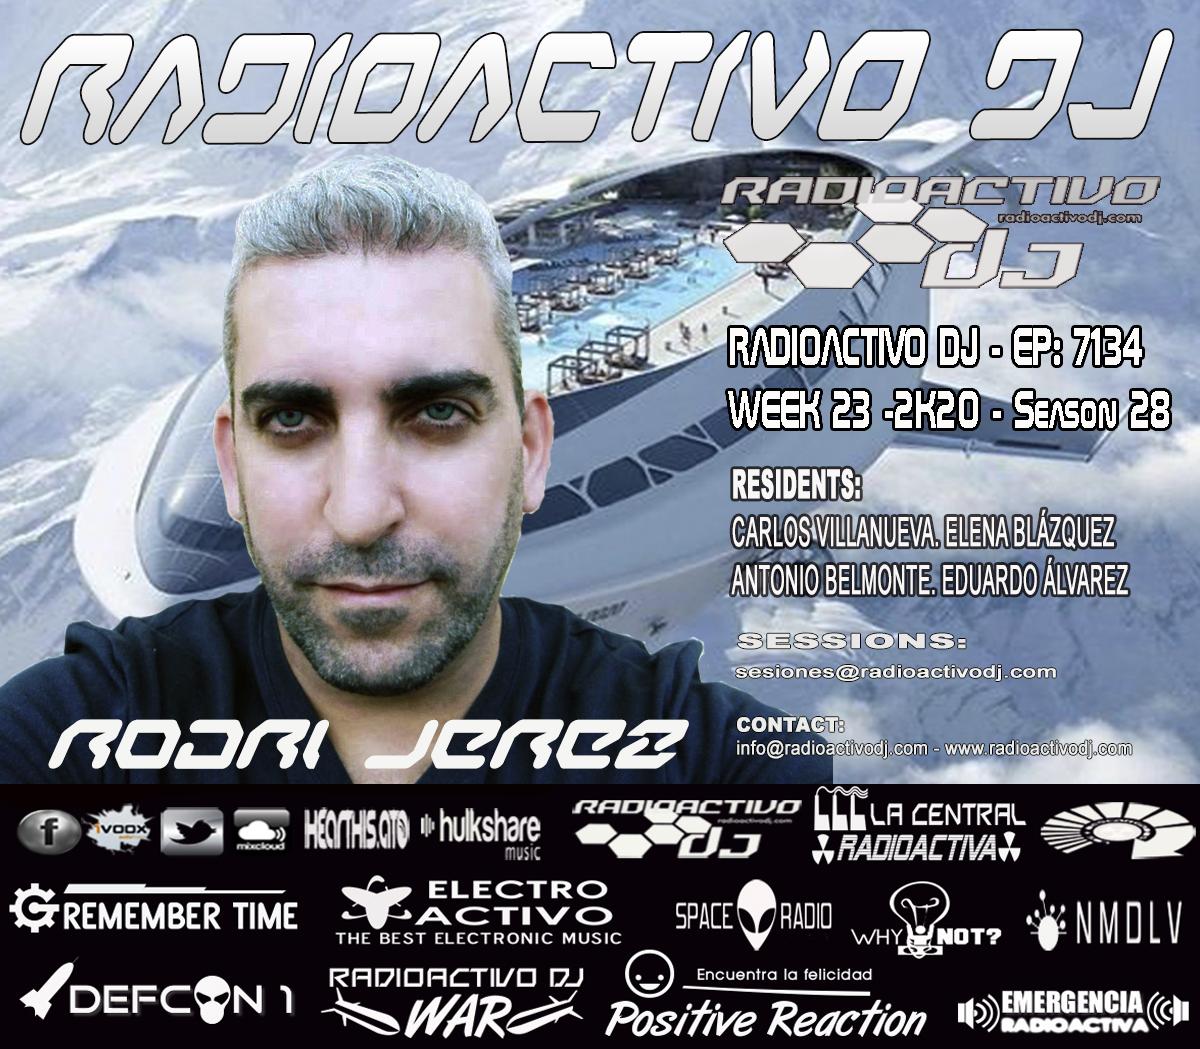 RADIOACTIVO-DJ-23-2020